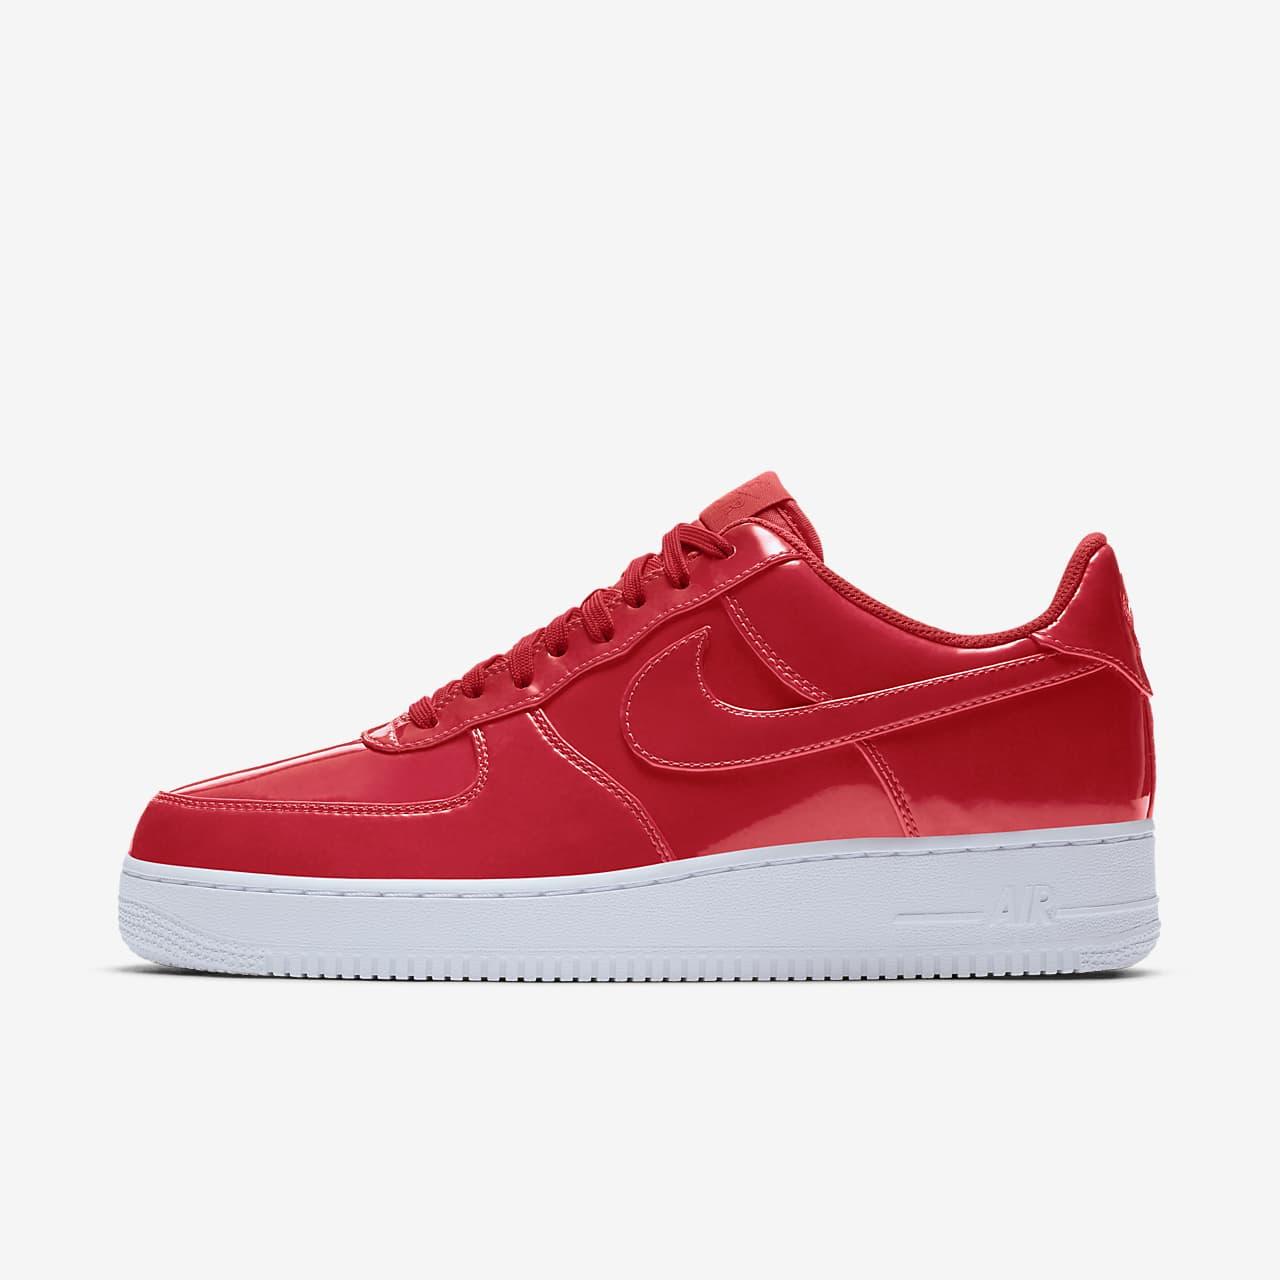 Nike Air Force 1 '07 LV8 UV Men's Shoe